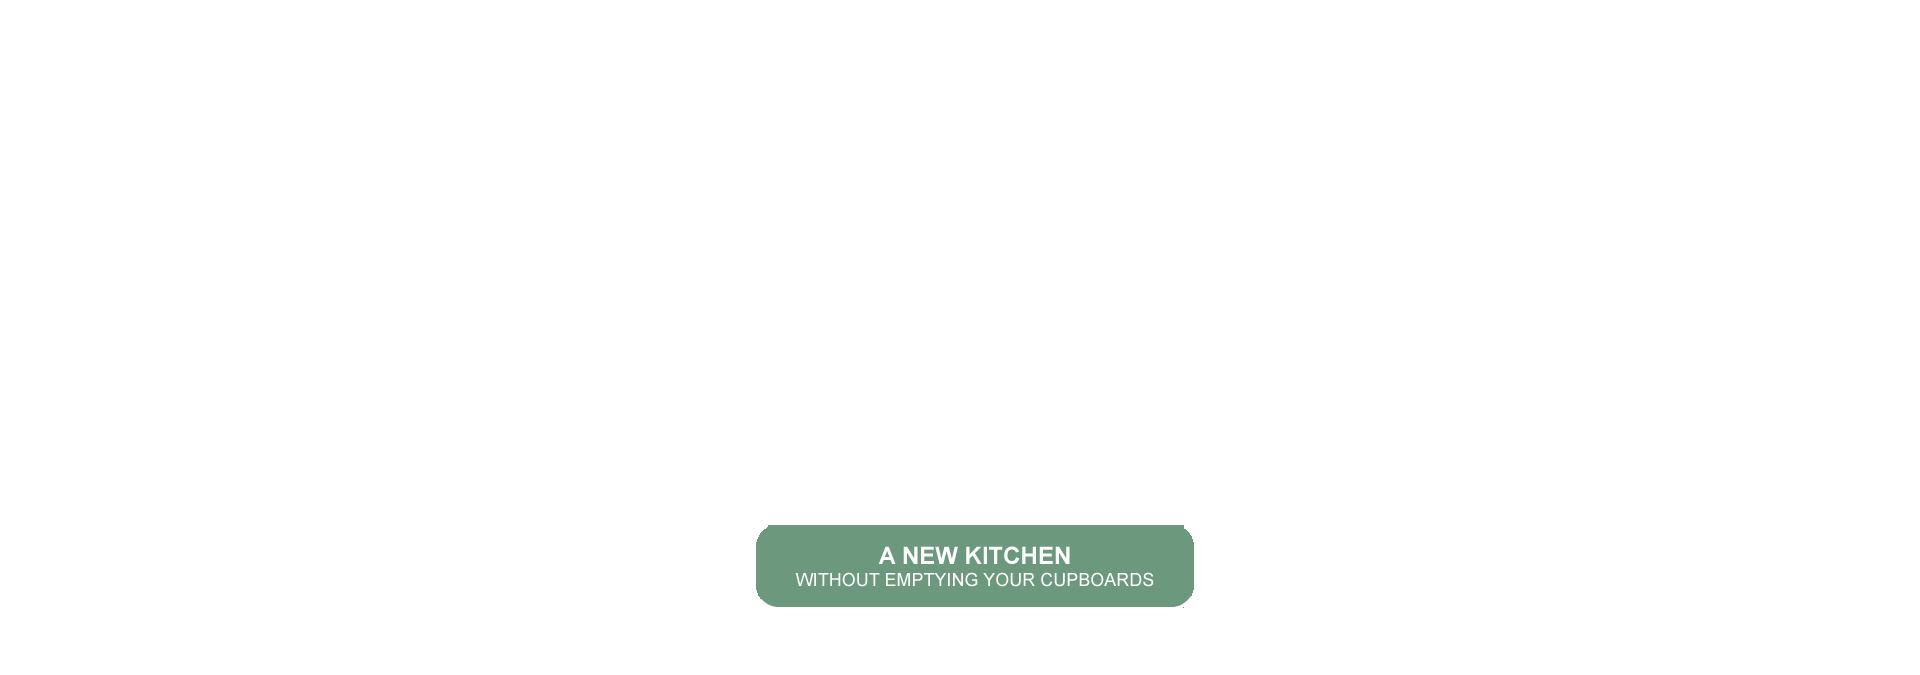 Transform Kitchens Doors Cheshunt